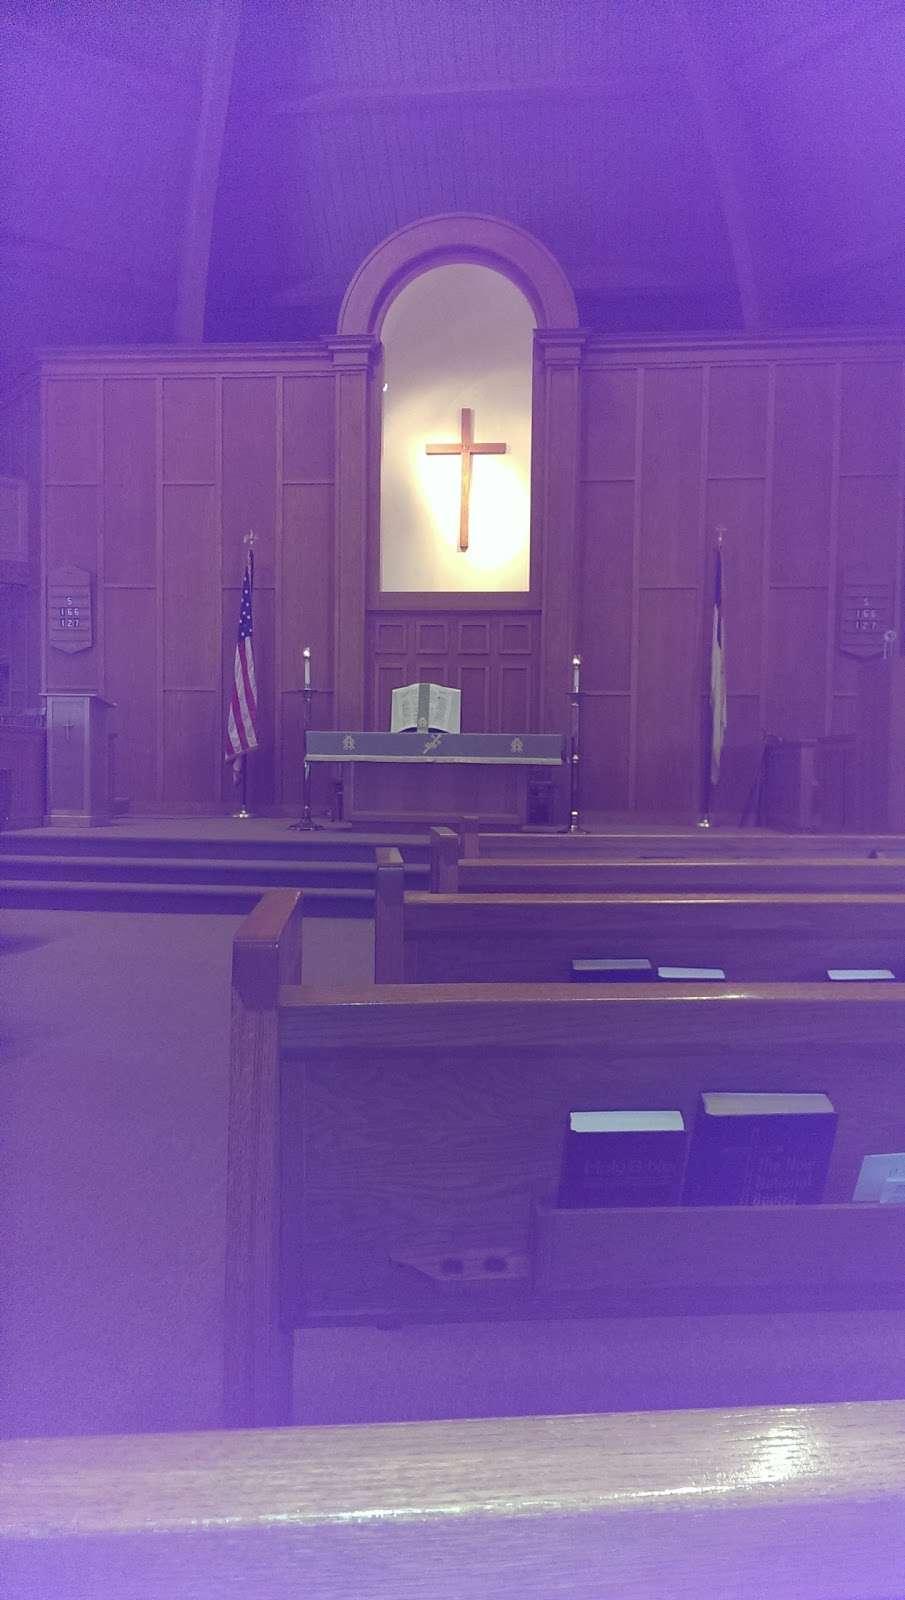 First Baptist Church - church  | Photo 2 of 3 | Address: 407 New Rochelle Rd, Bronxville, NY 10708, USA | Phone: (914) 793-2560